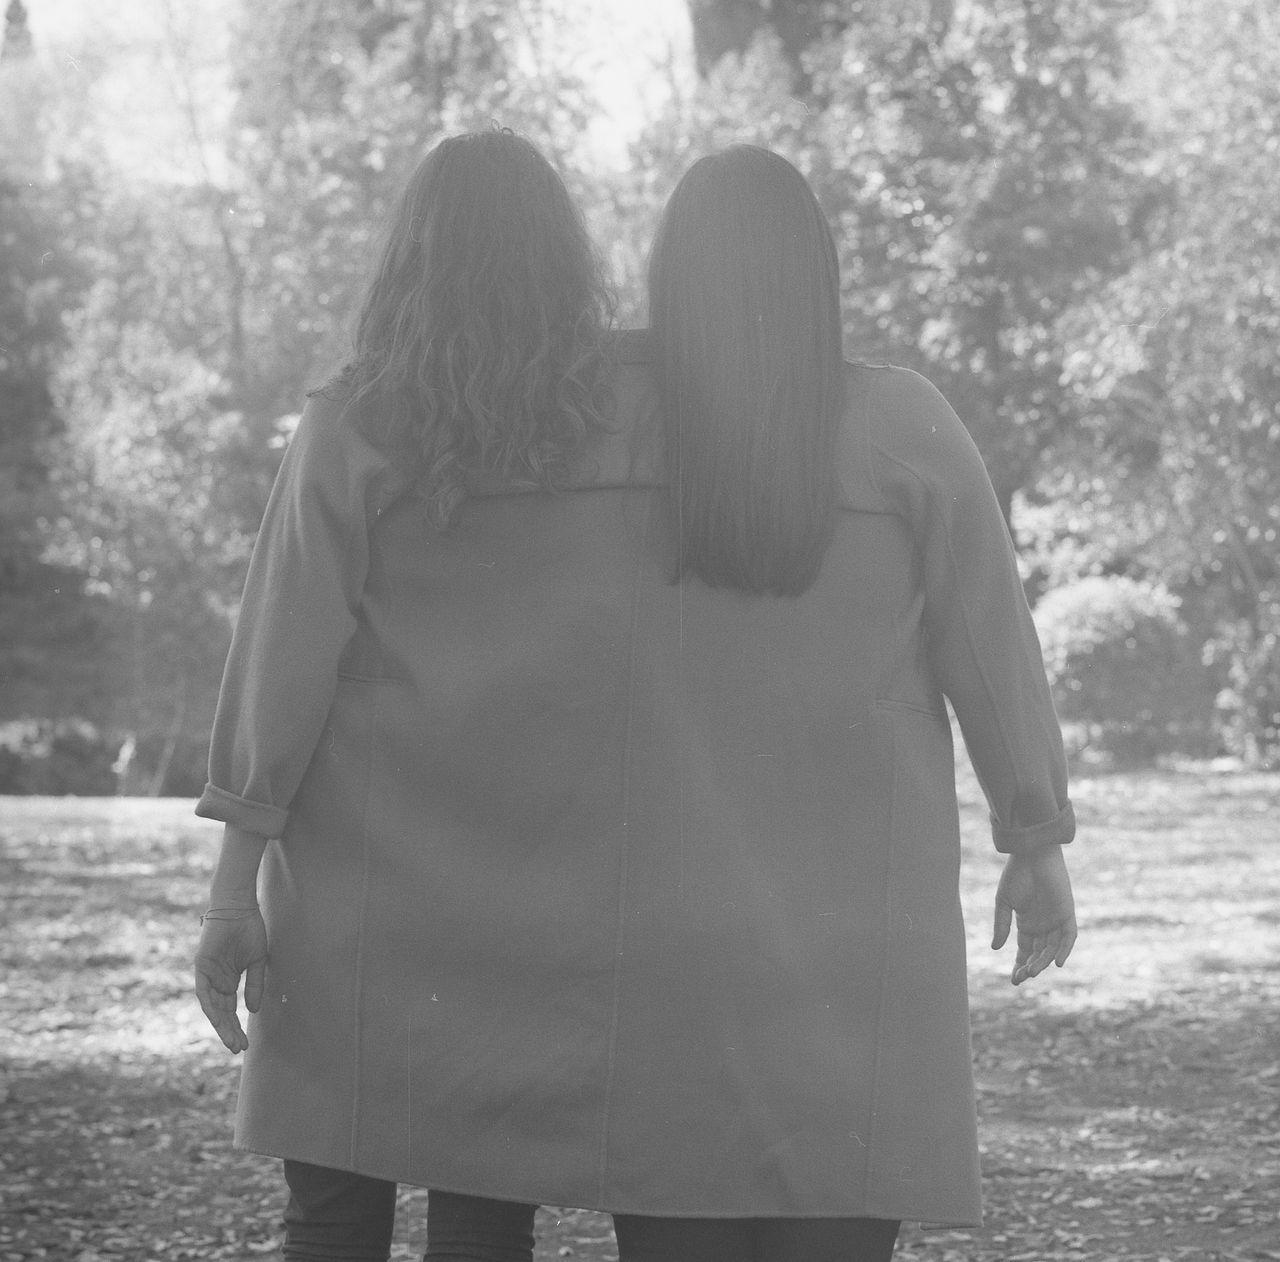 Lesbian couple wearing jacket in forest